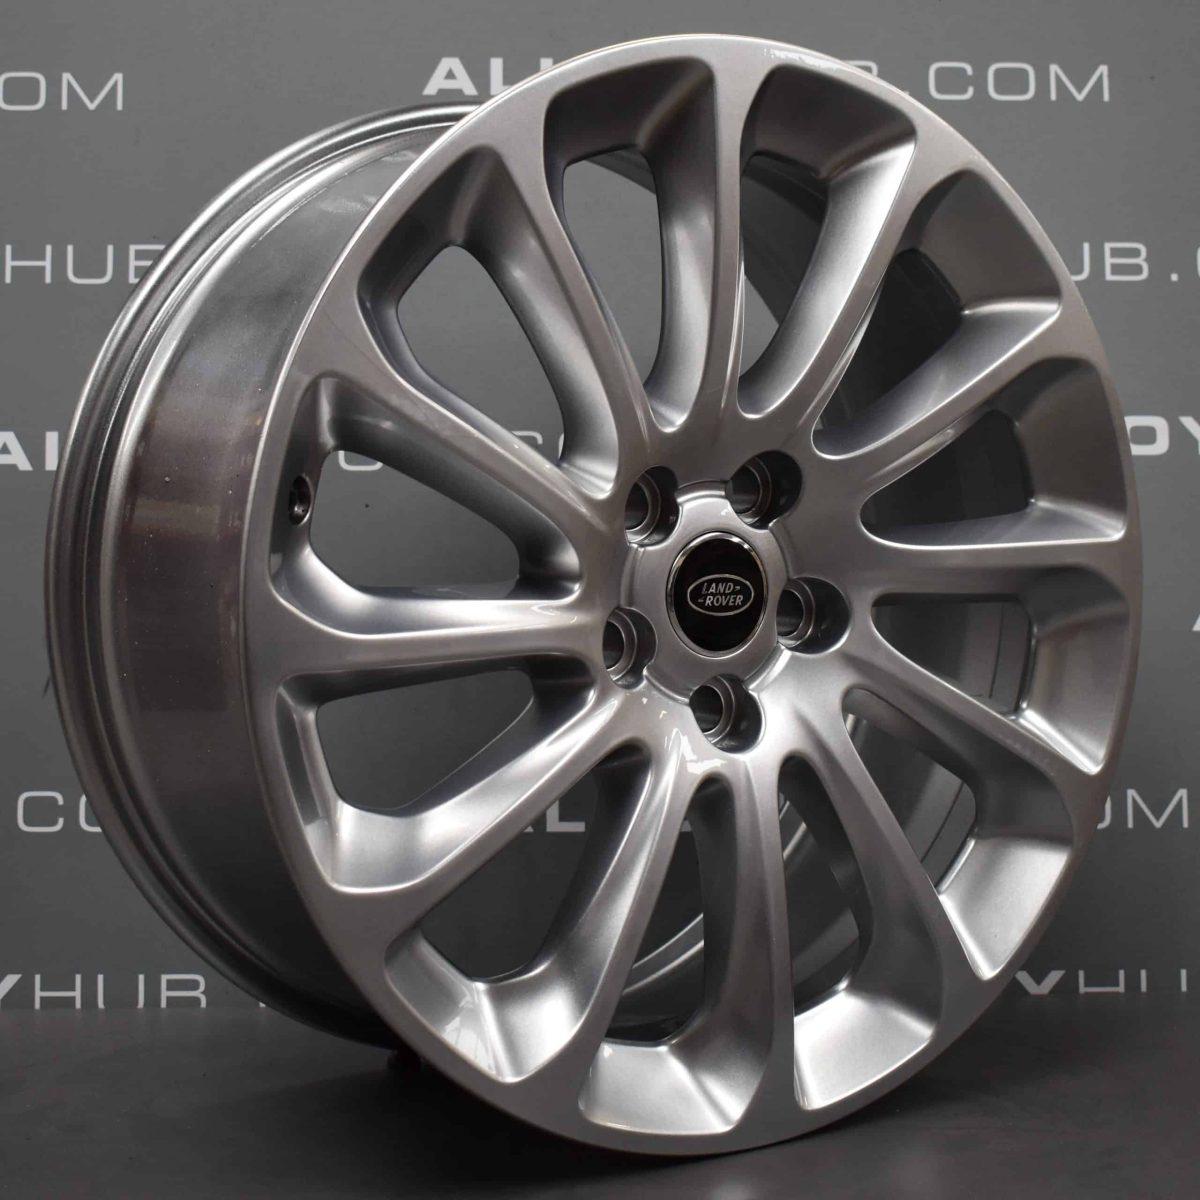 "Genuine Land Rover Range Rover Sport/Vogue L494 L405 Style 1065 20"" inch 12 Spoke Silver Alloy Wheels LR098796"